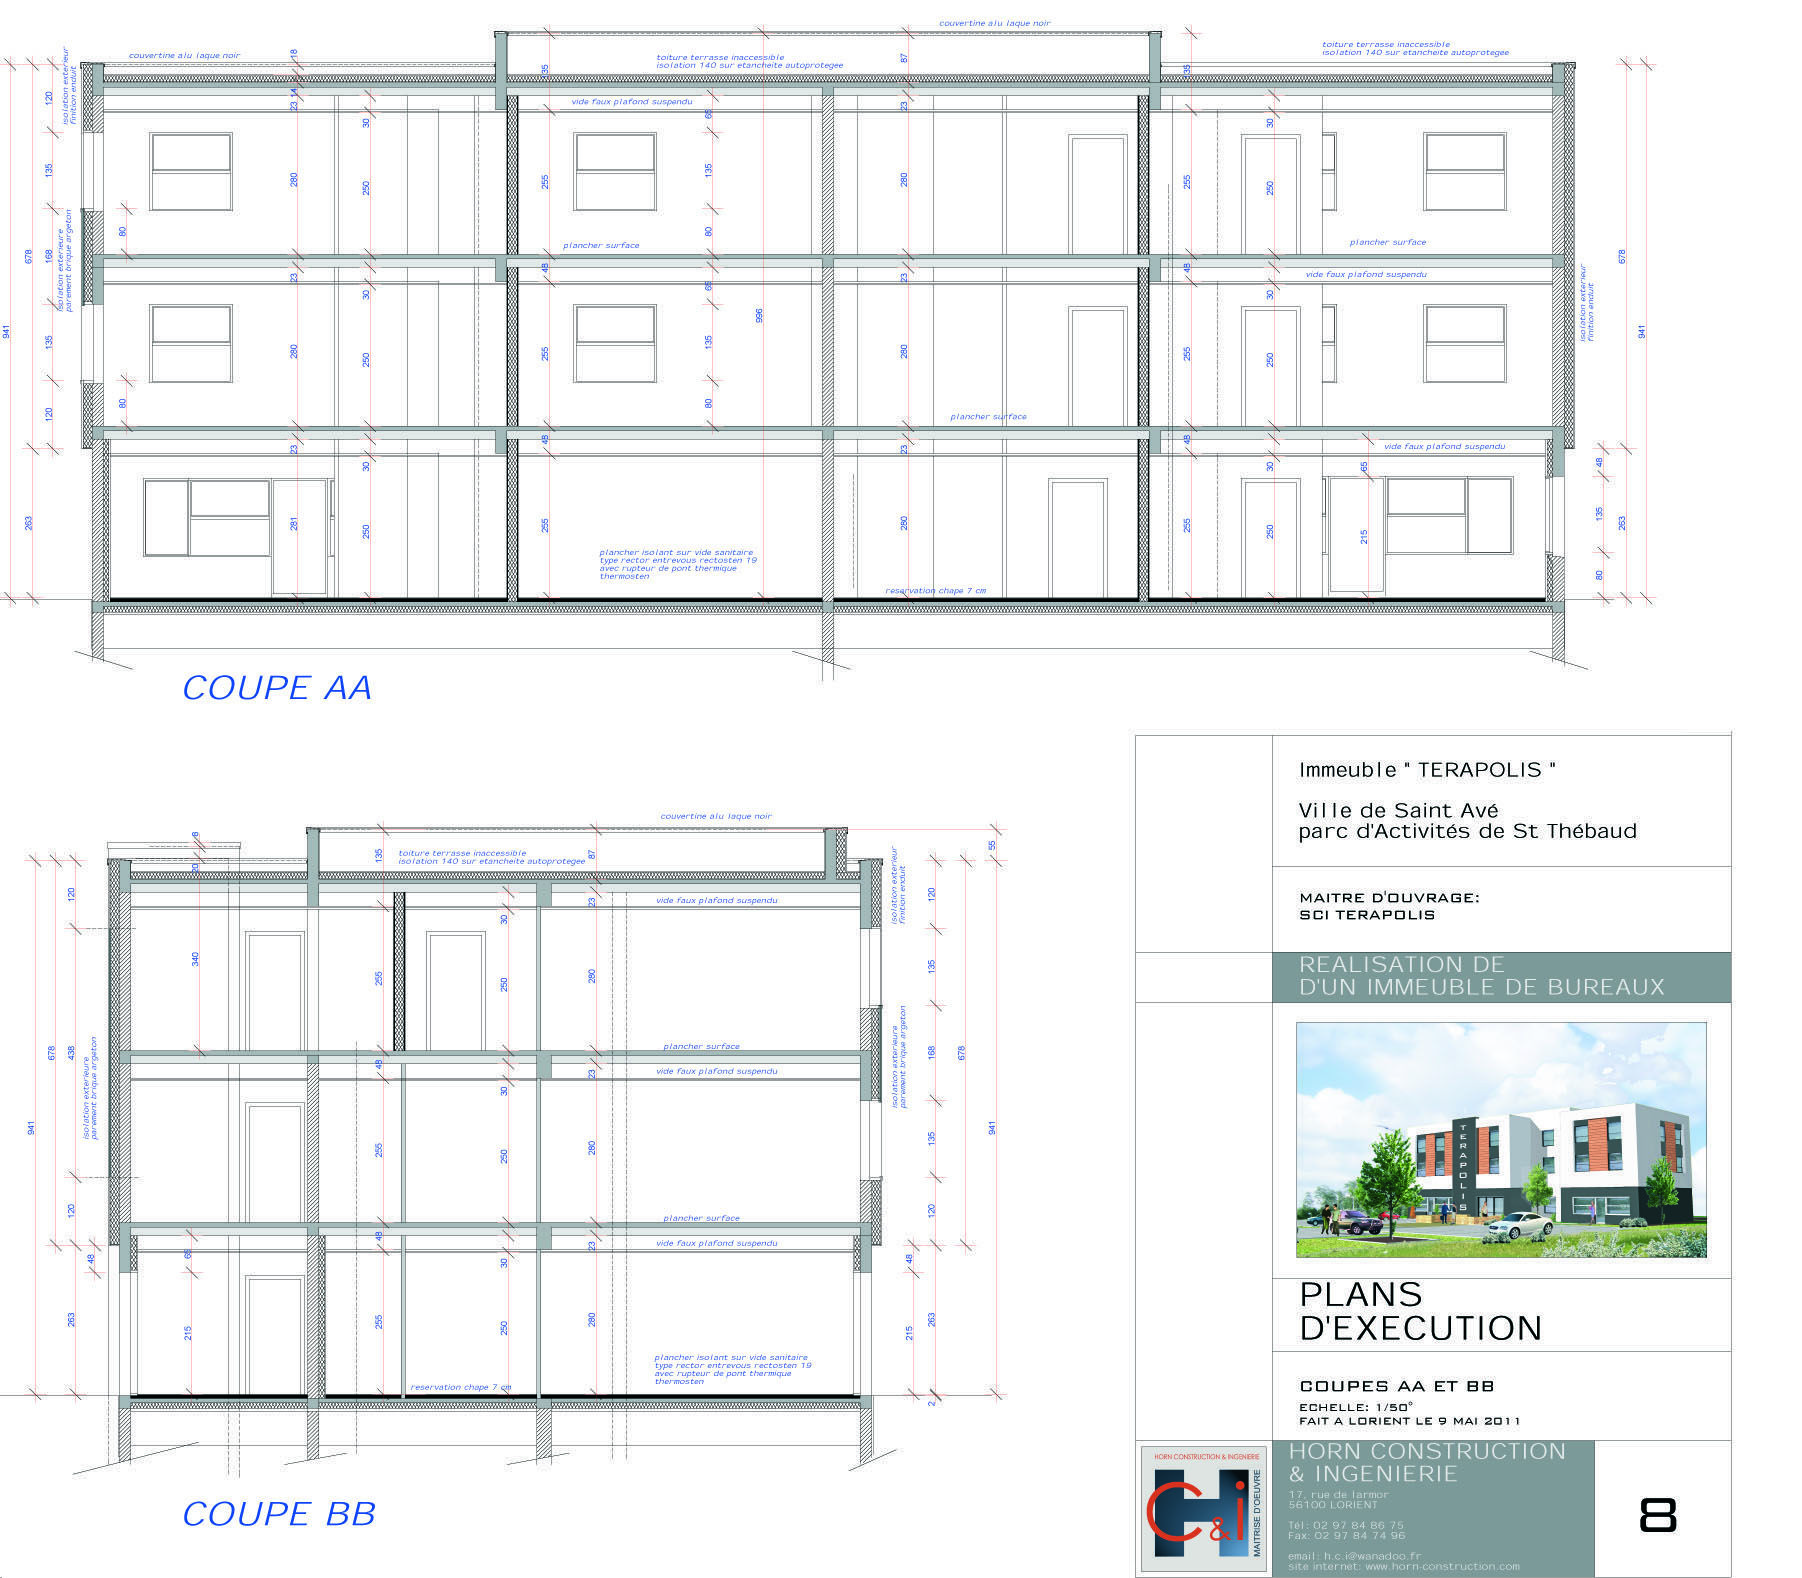 terapolis. Black Bedroom Furniture Sets. Home Design Ideas